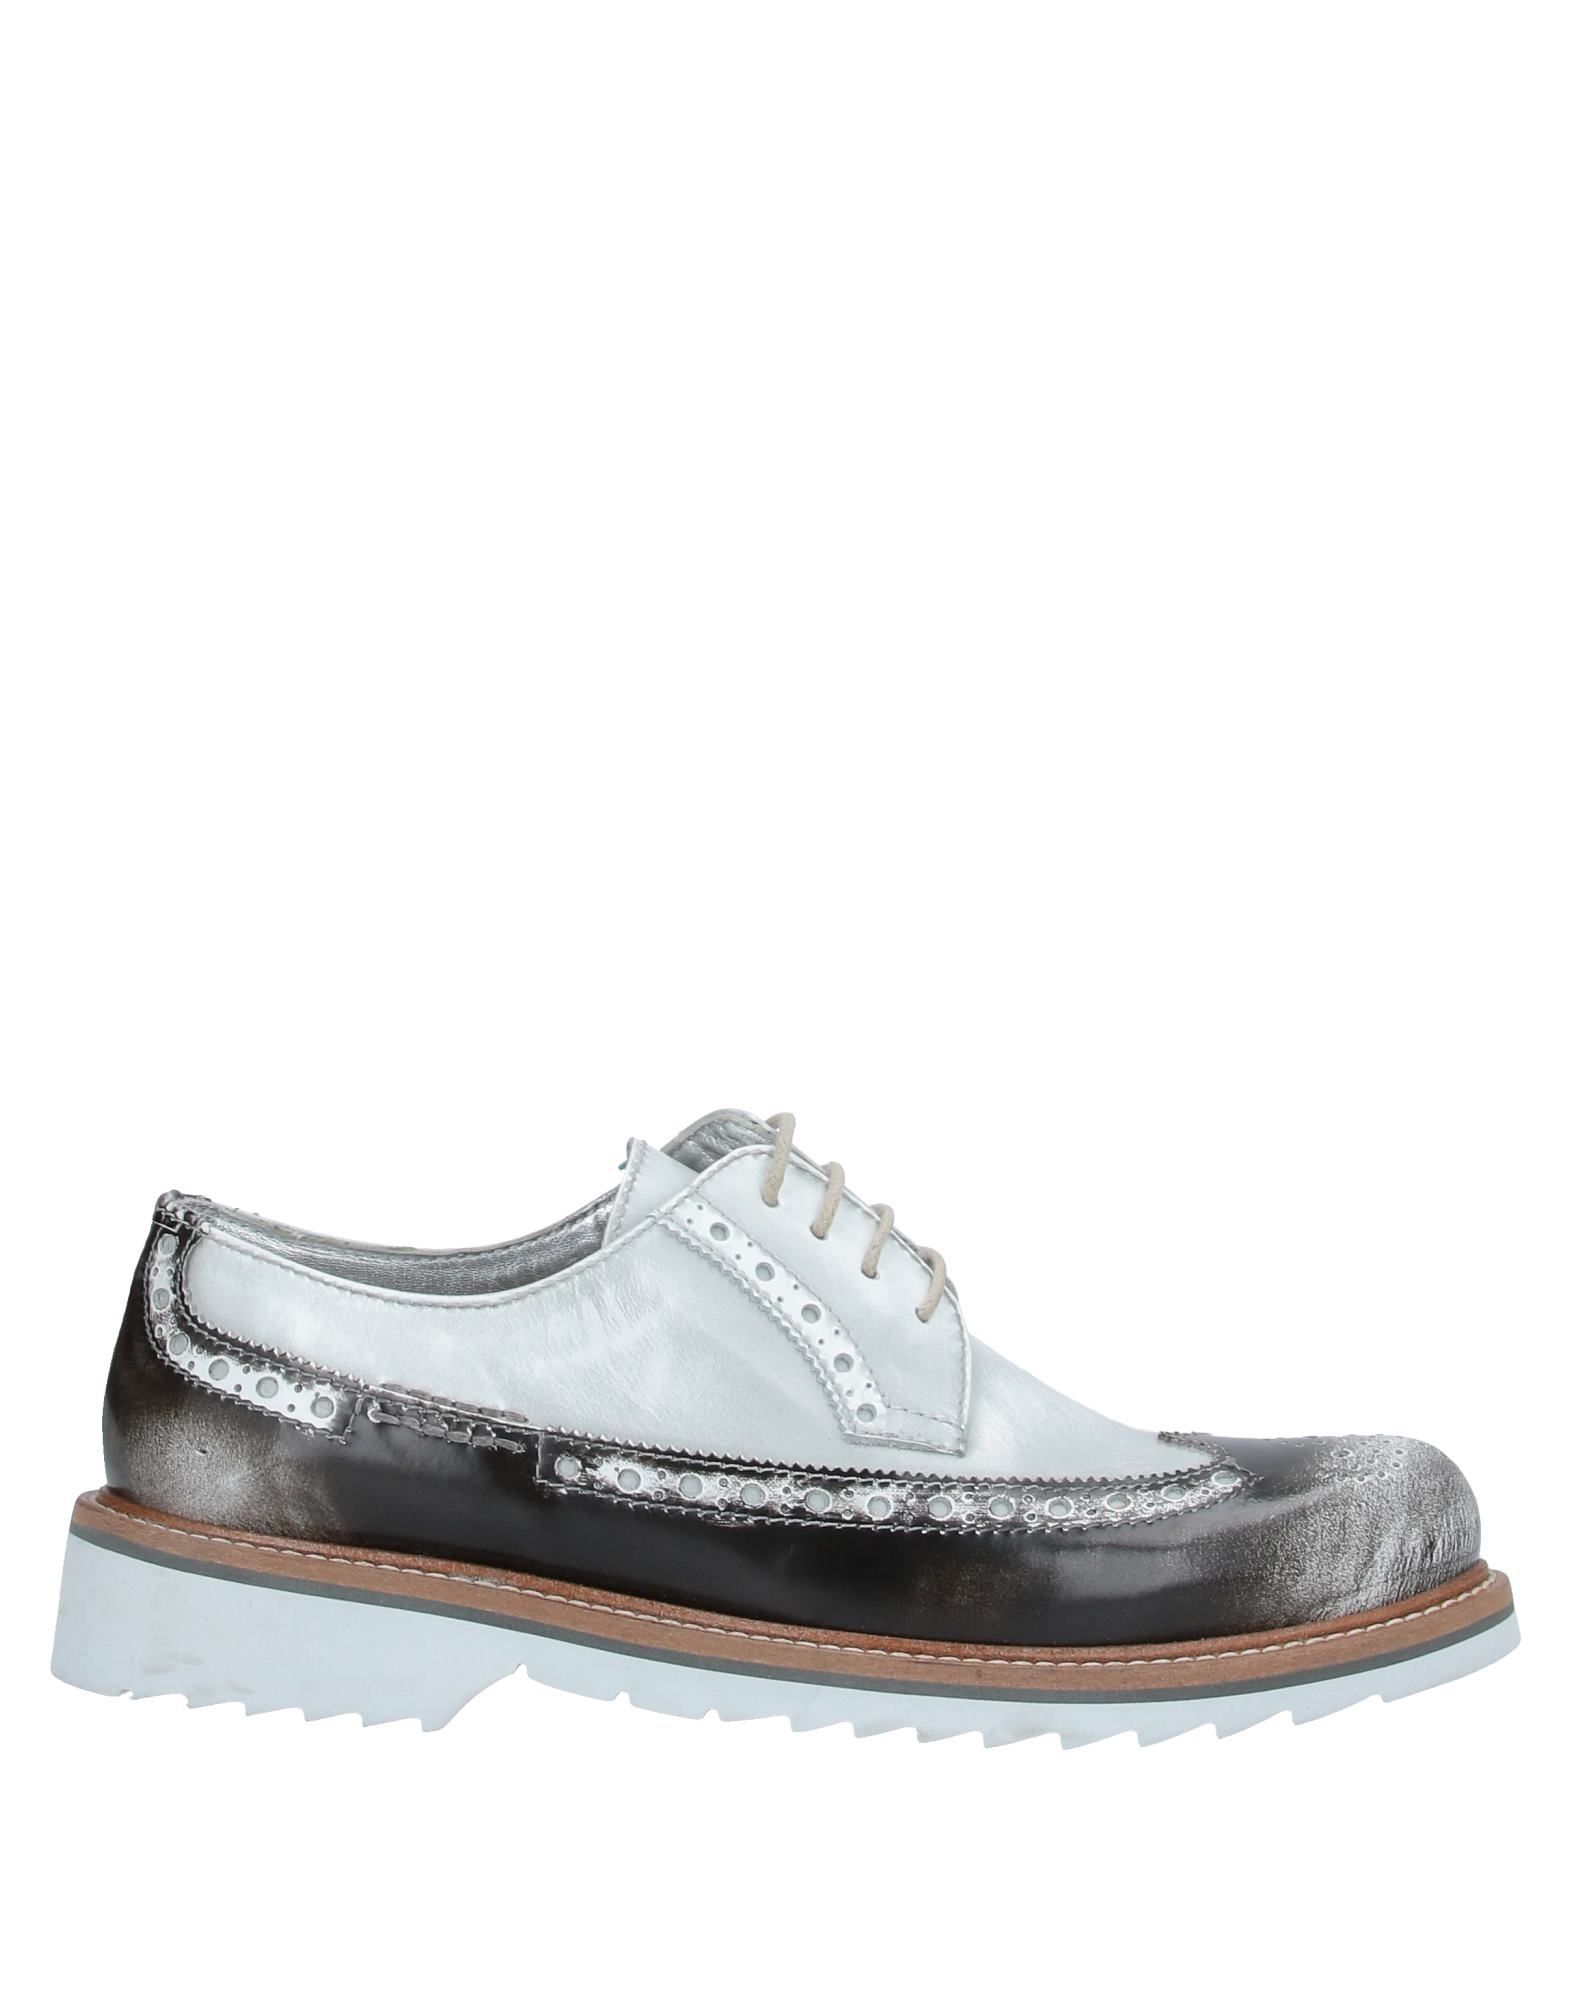 NICOLA BARBATO Обувь на шнурках nicola barbato мокасины